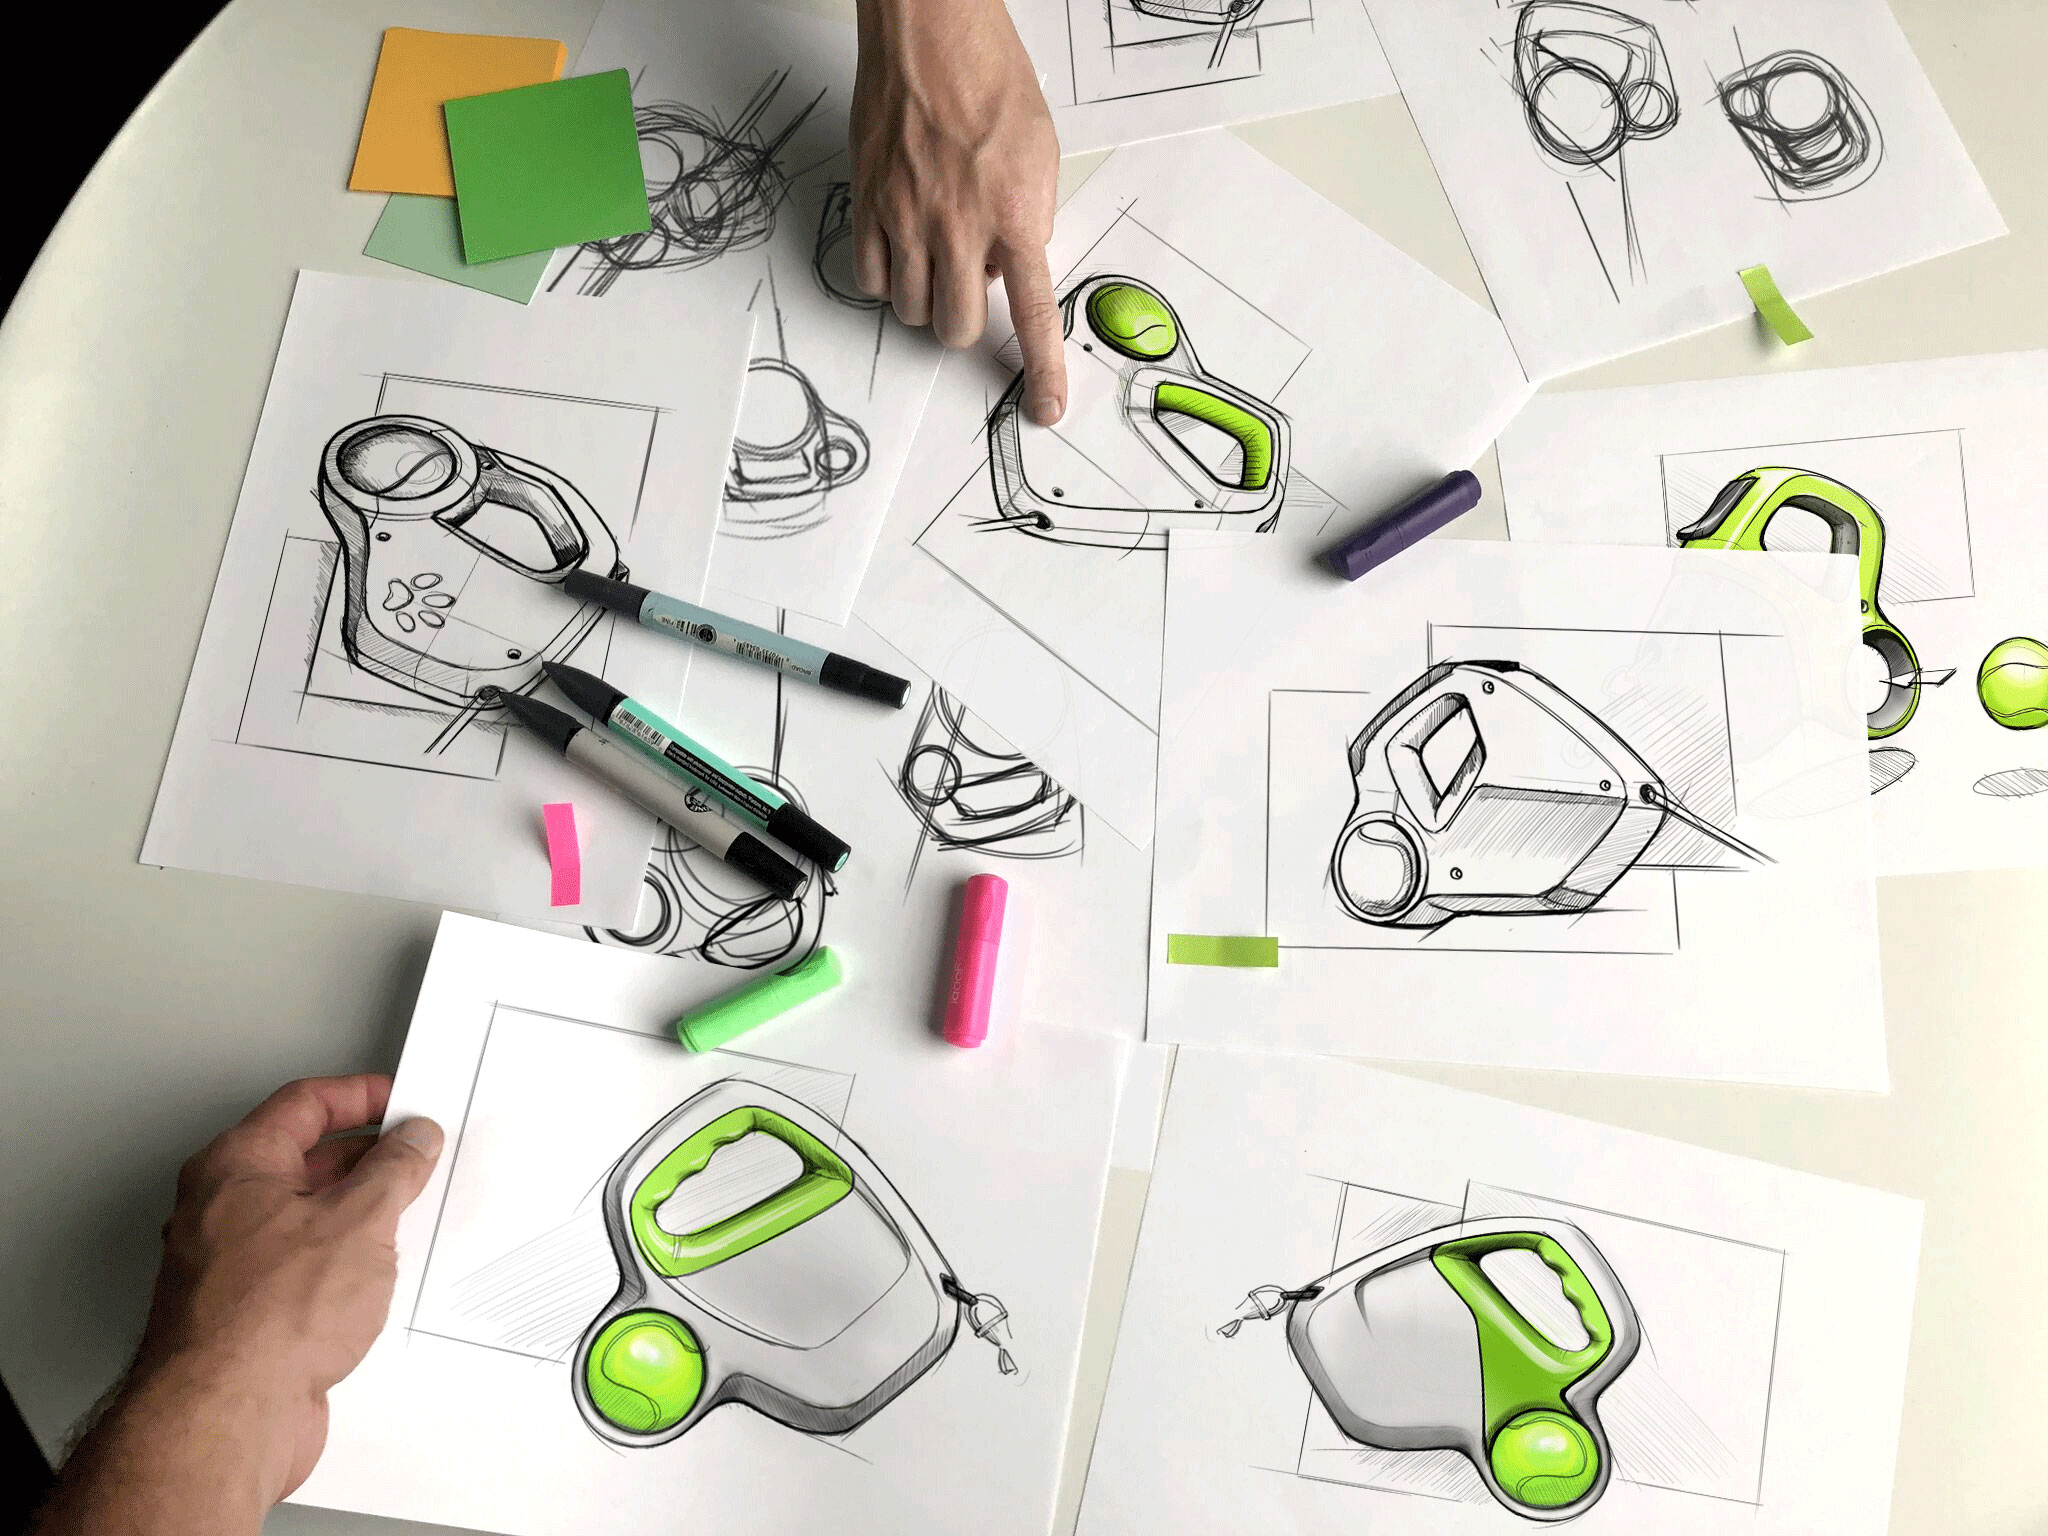 leash-sketches.jpg